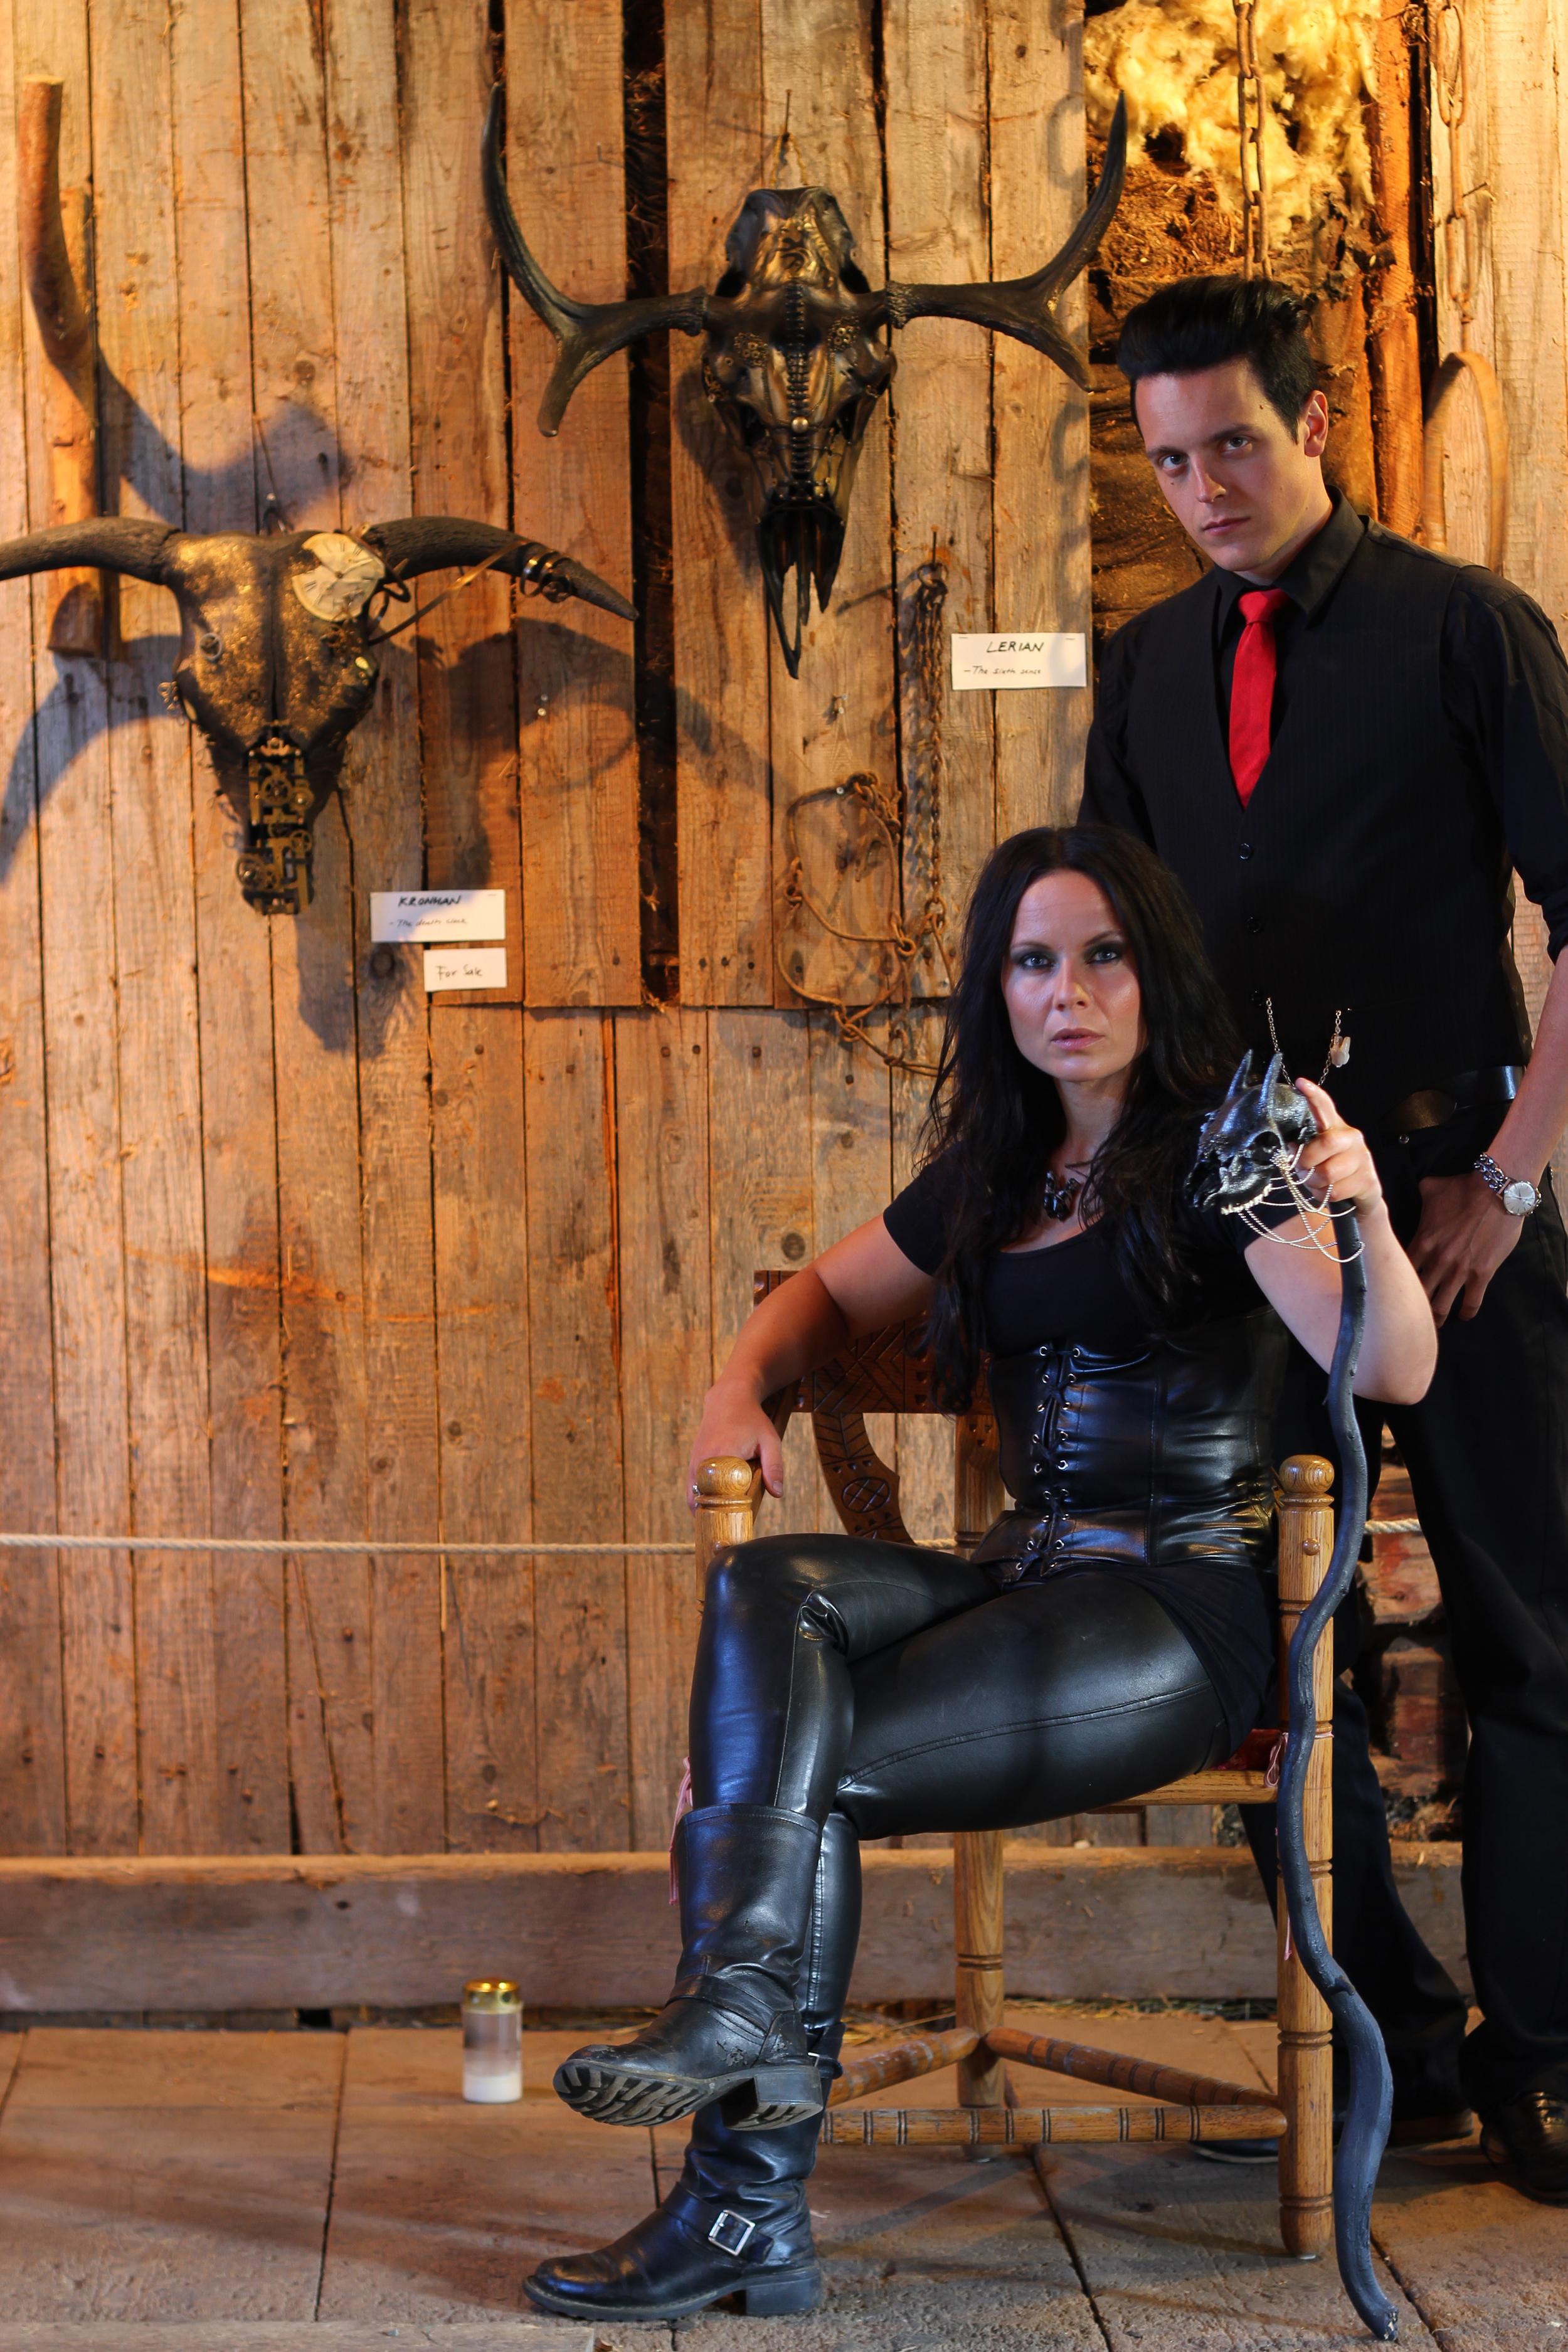 Petra Shara Stoor and Fredrik Fernlund at Skulls & Bones Artwork, Jättendal, Sweden